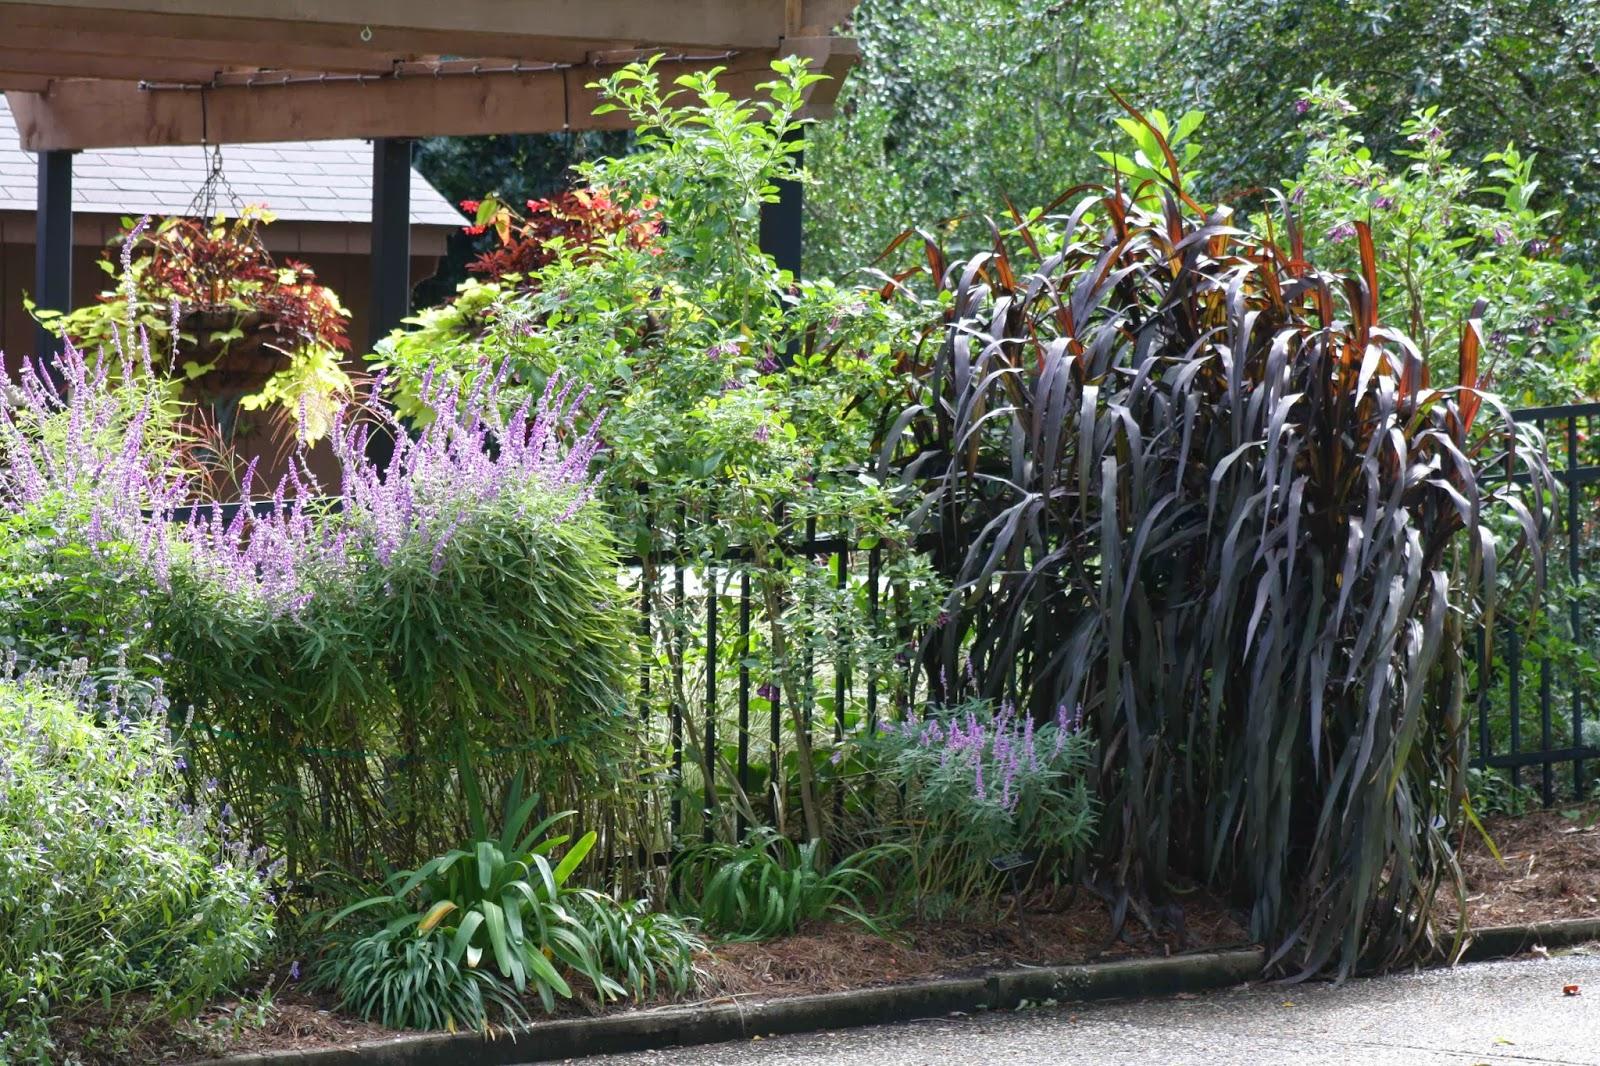 Tall Decorative Grass Roses And Other Gardening Joys Garden Inspiration